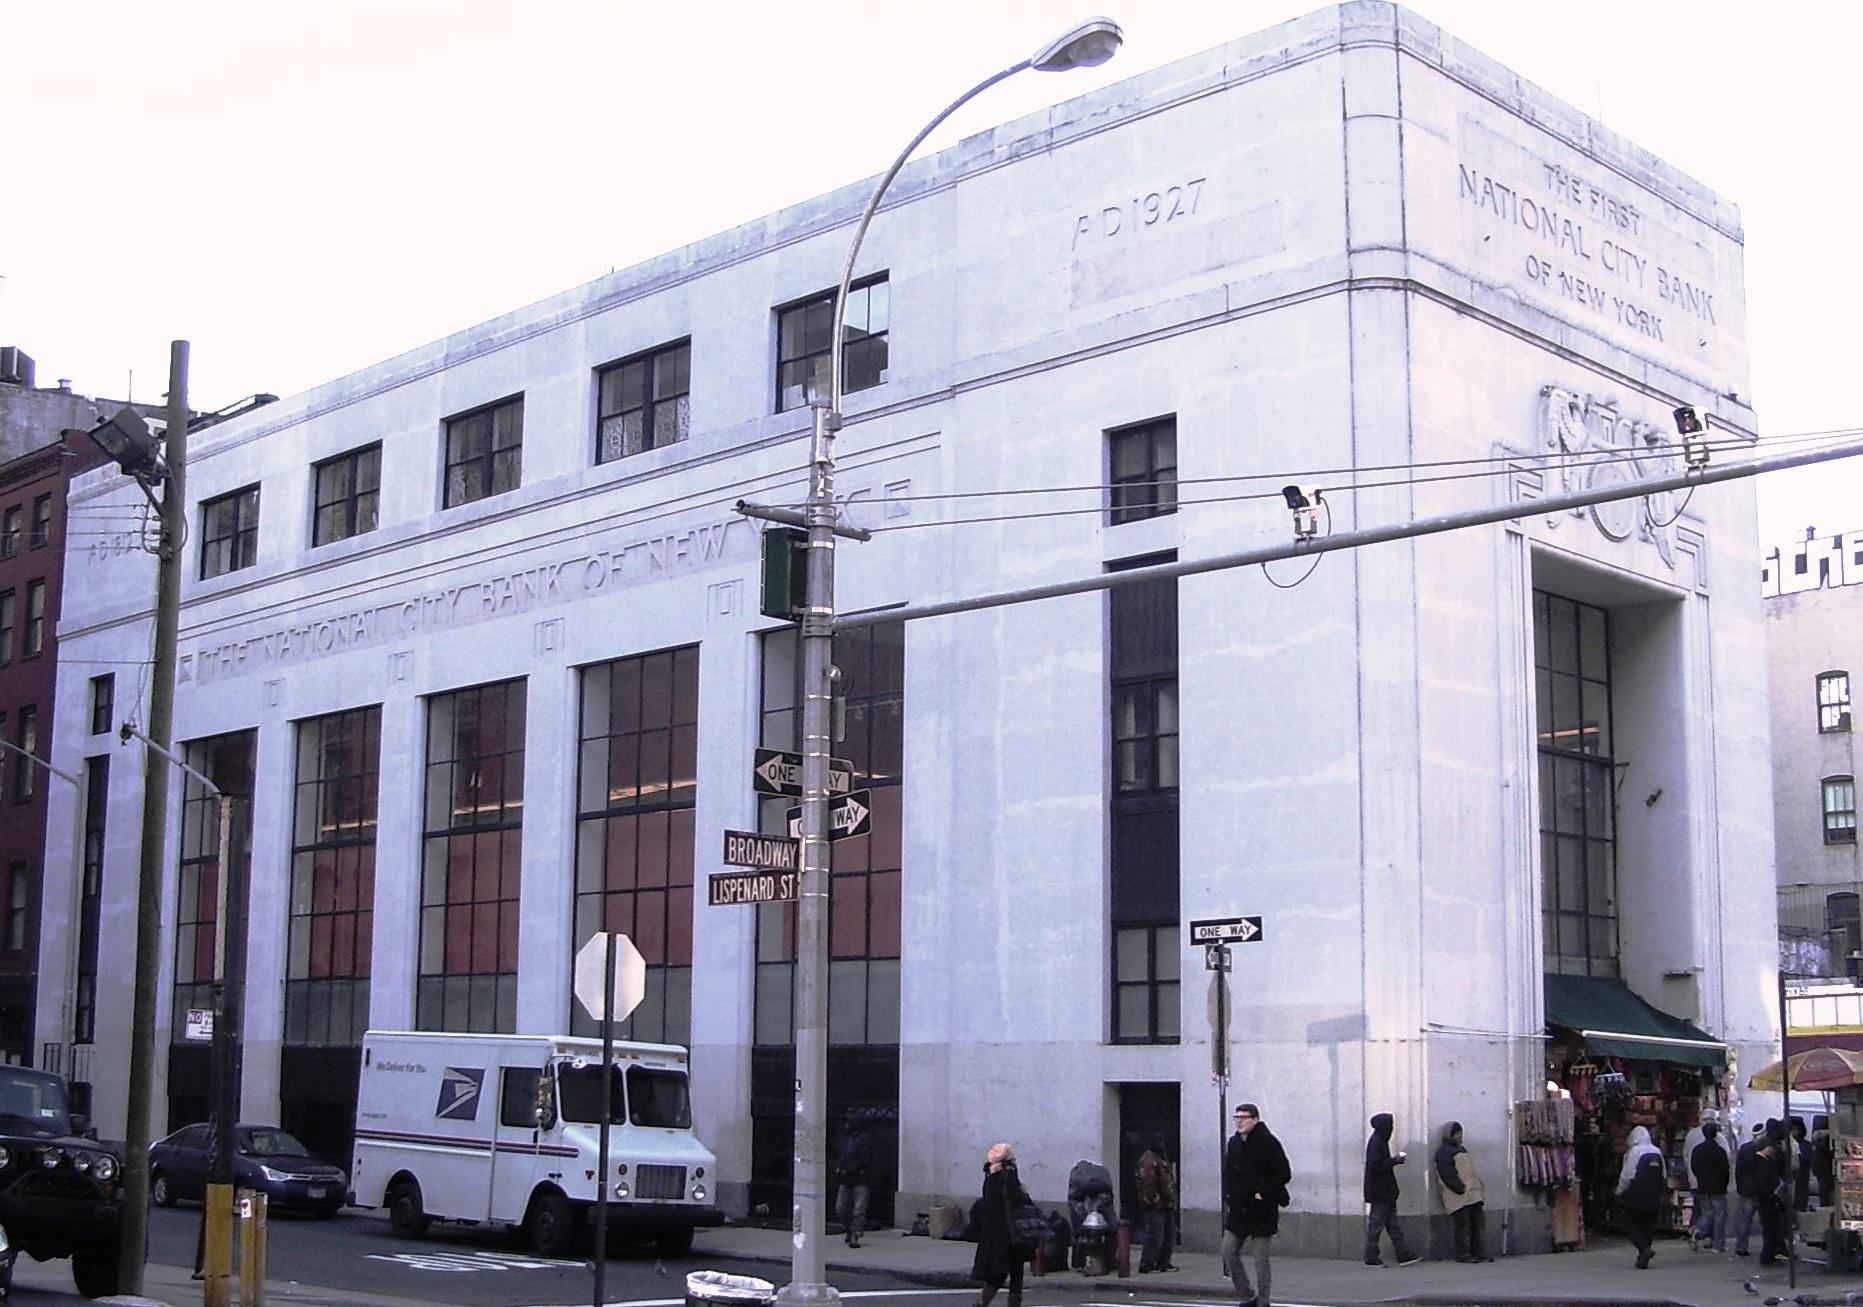 National City Bank Building New York